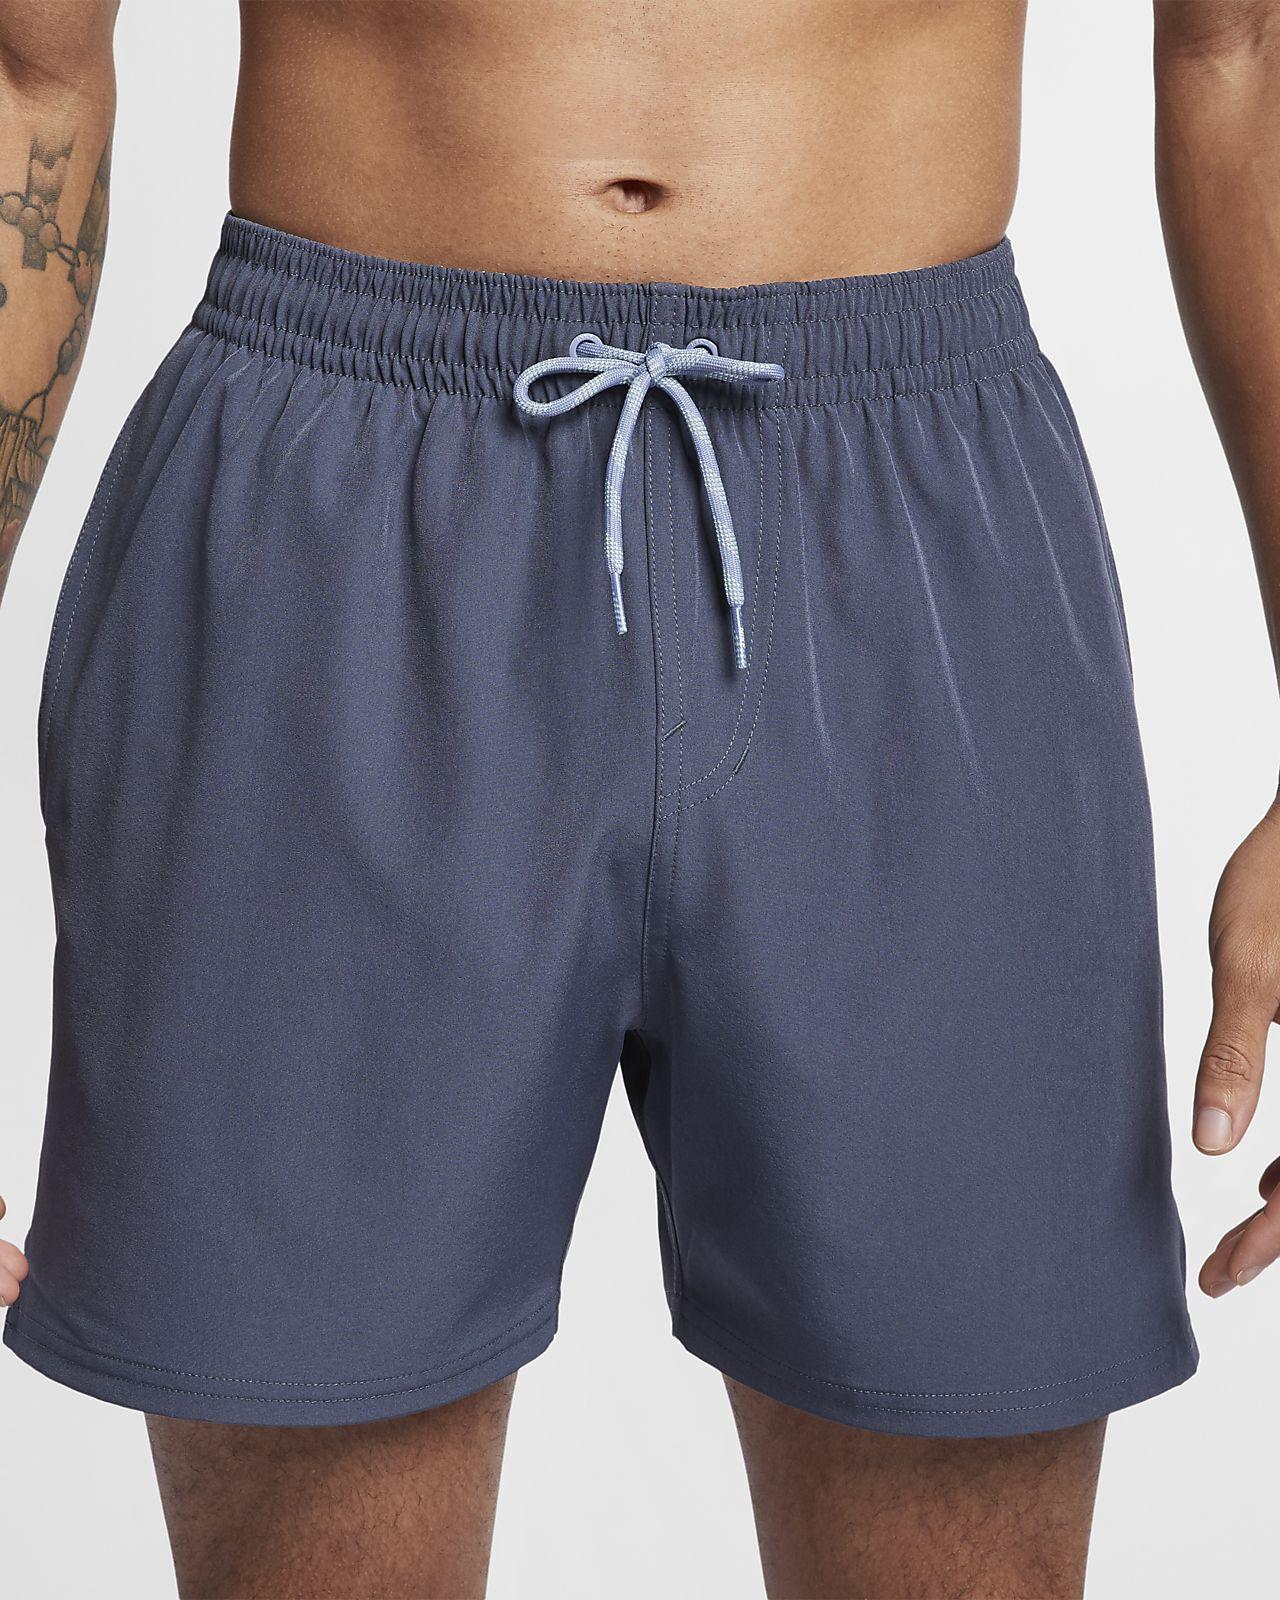 Badshorts Nike Swim Retro Stripe Lap 13 cm för män